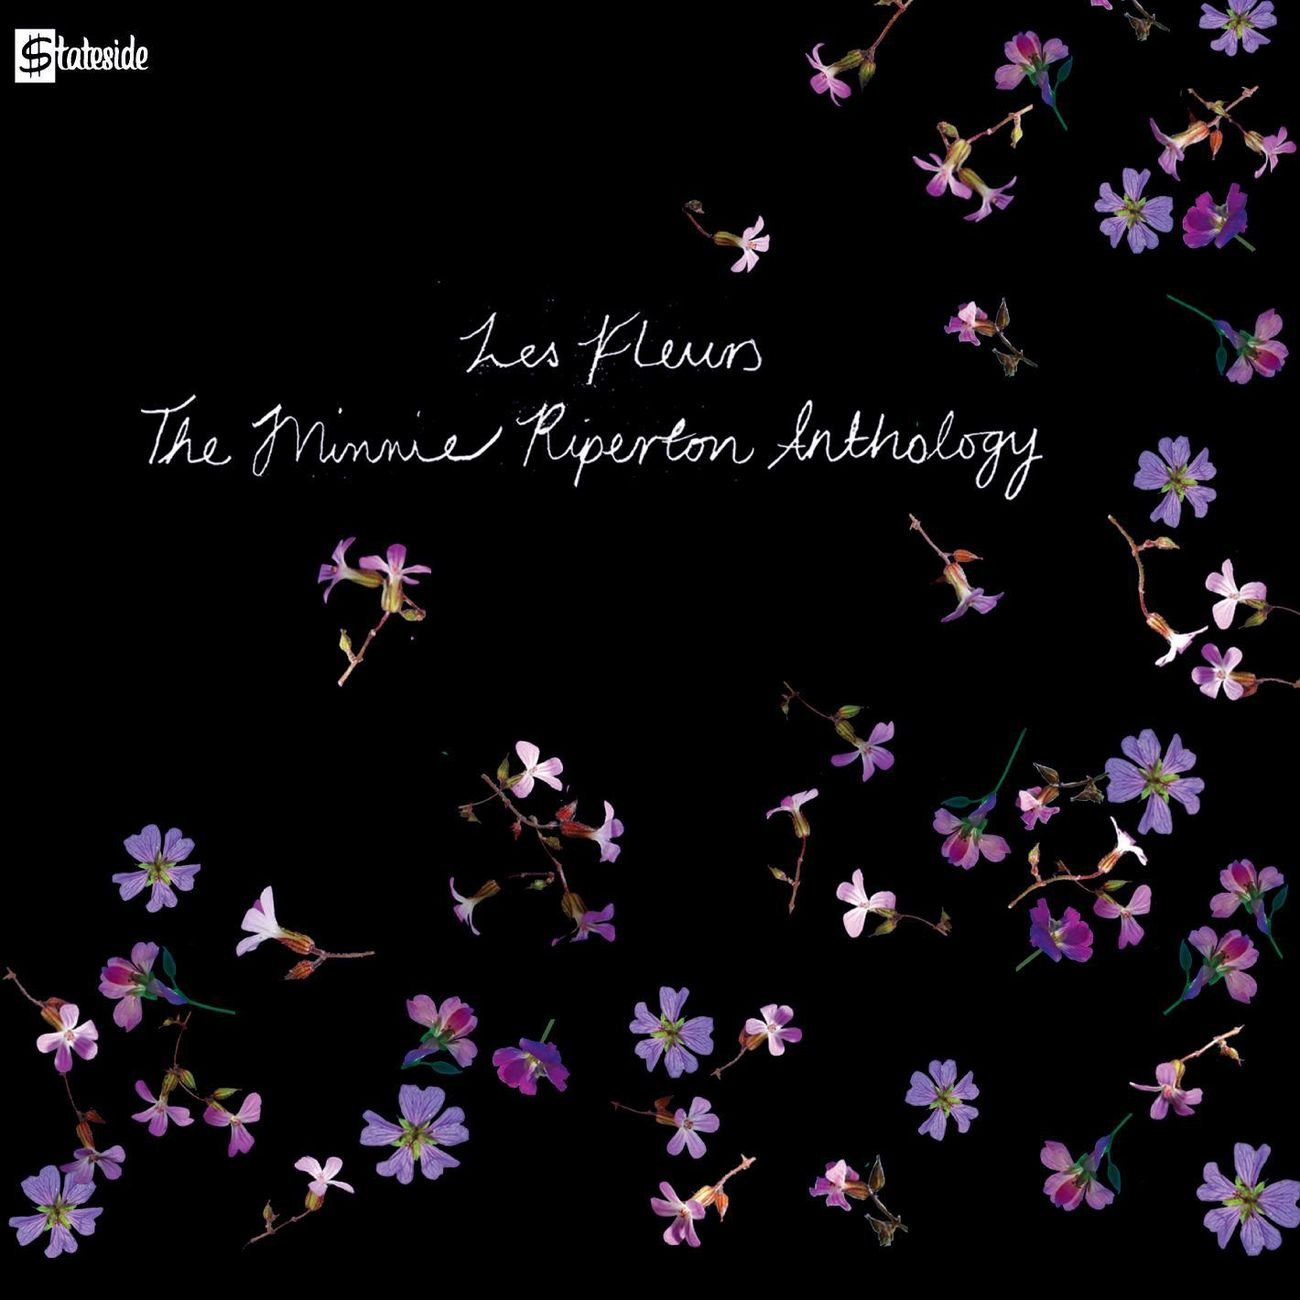 Les Fleurs: The Minnie Riperton Anthology